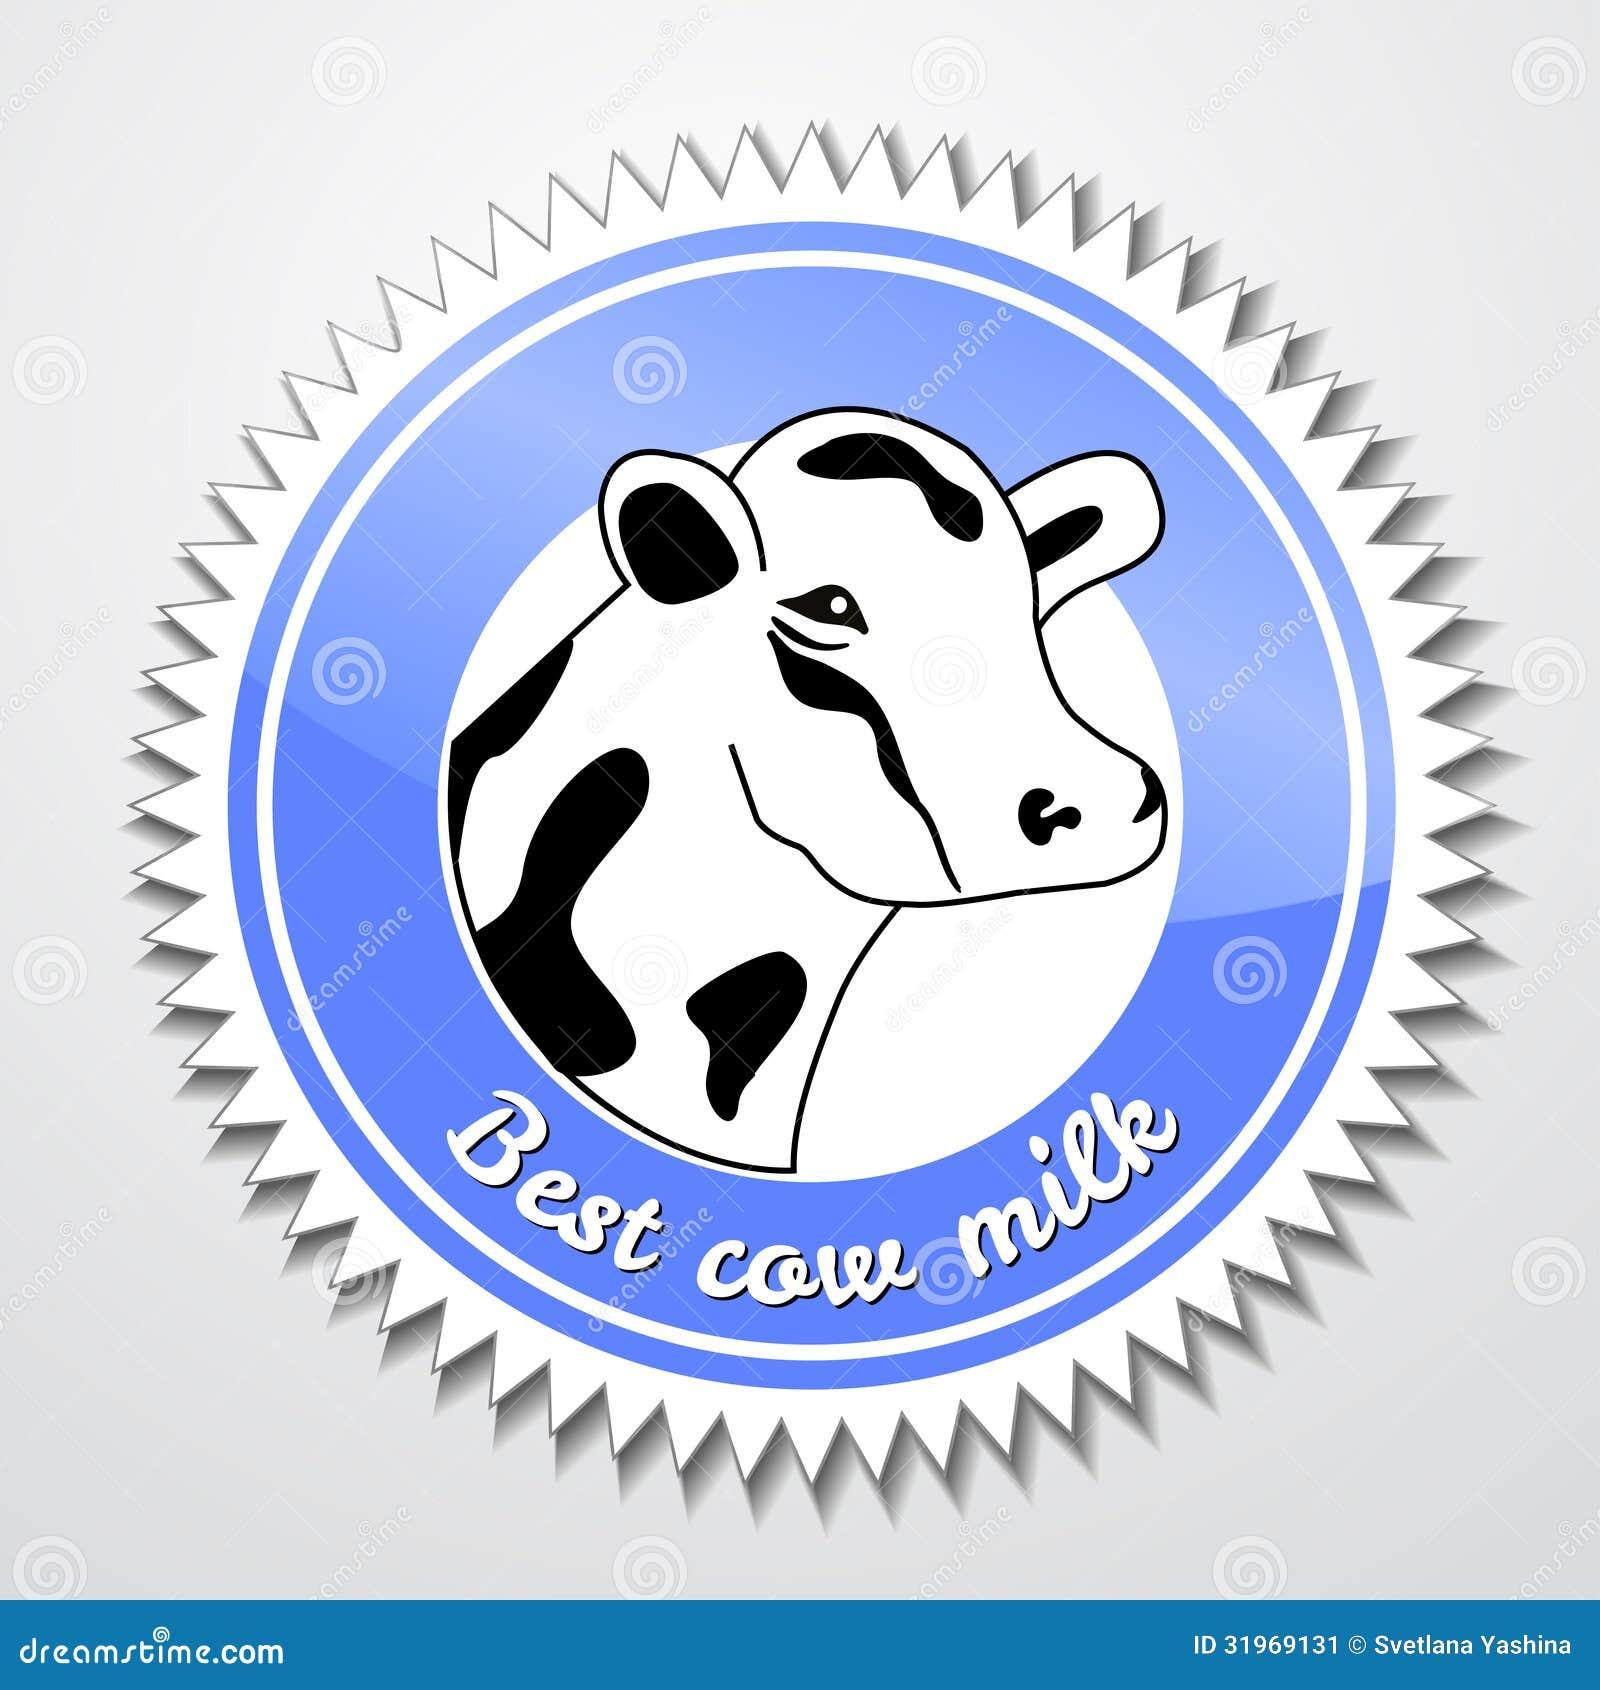 Dairy cow logo - photo#27